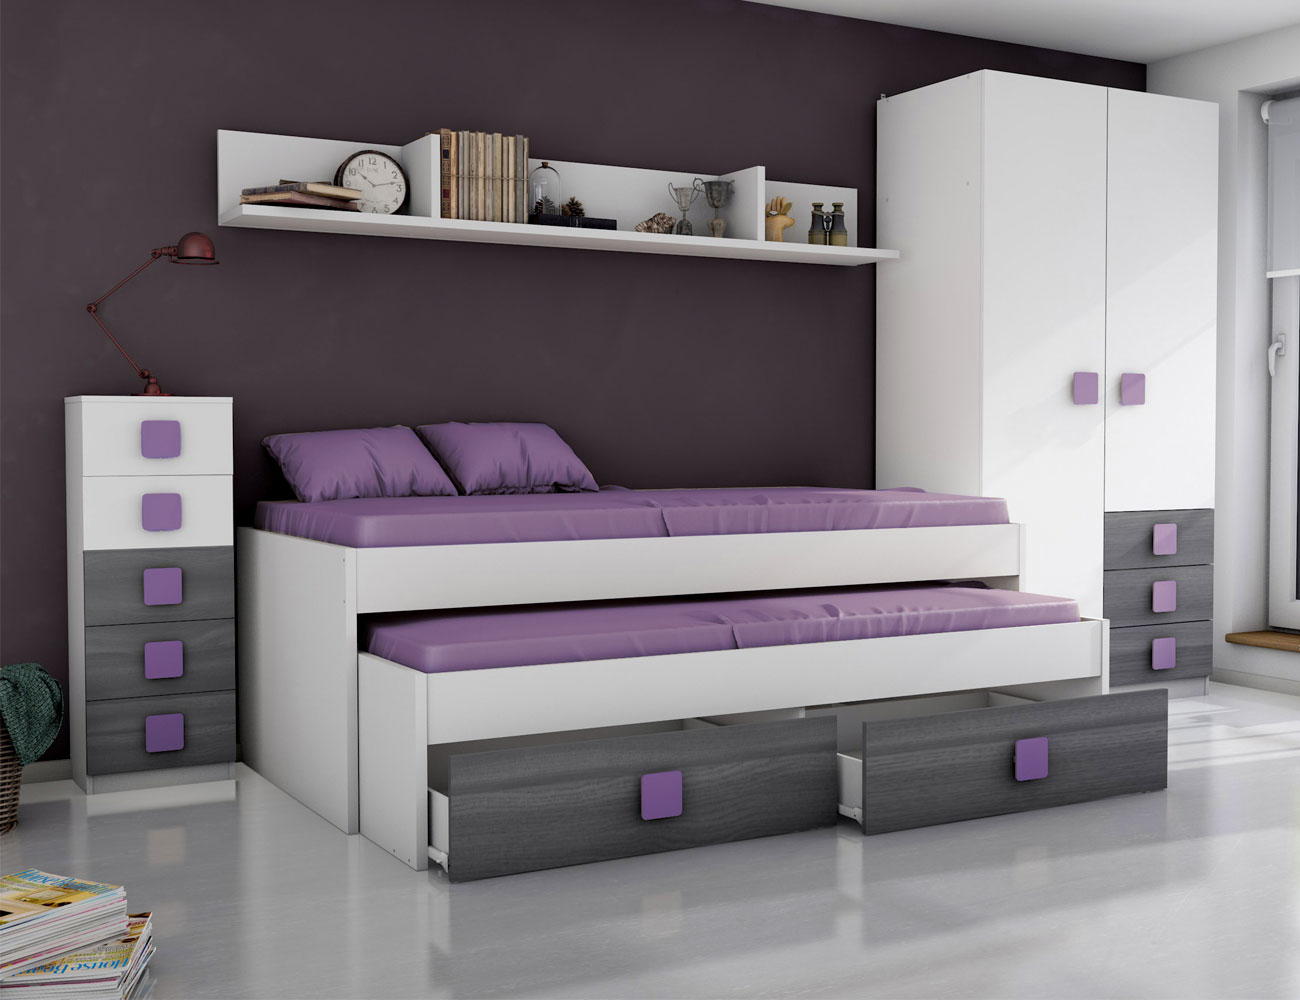 Dormitorio juvenil ceniza azul6